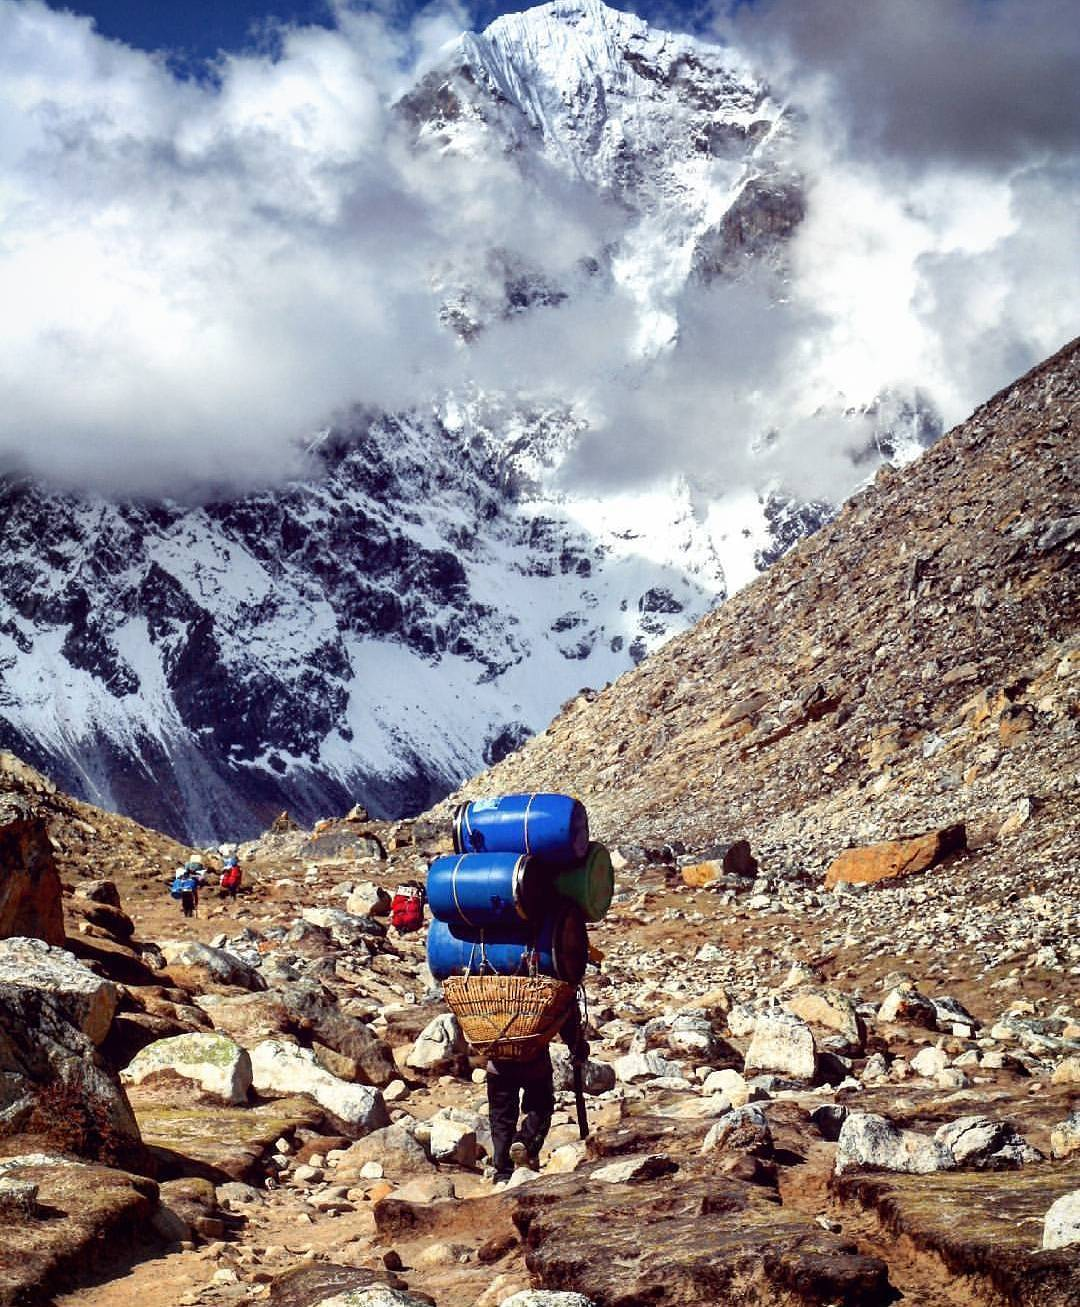 The Sherpa porters by Sundar Thapa